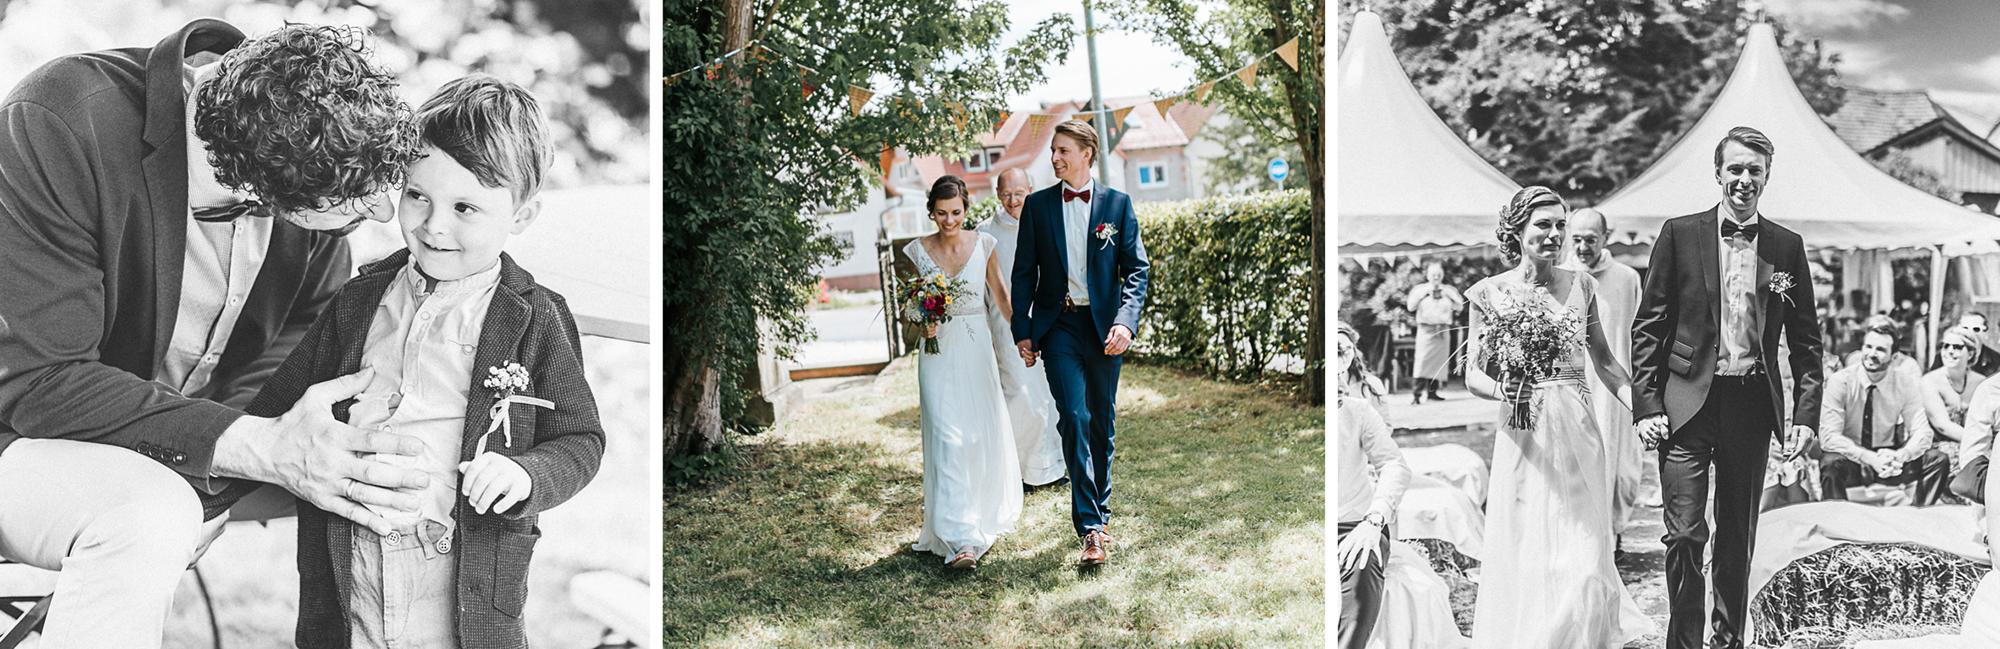 Boho Wedding Theresa Meyer - Fotografie